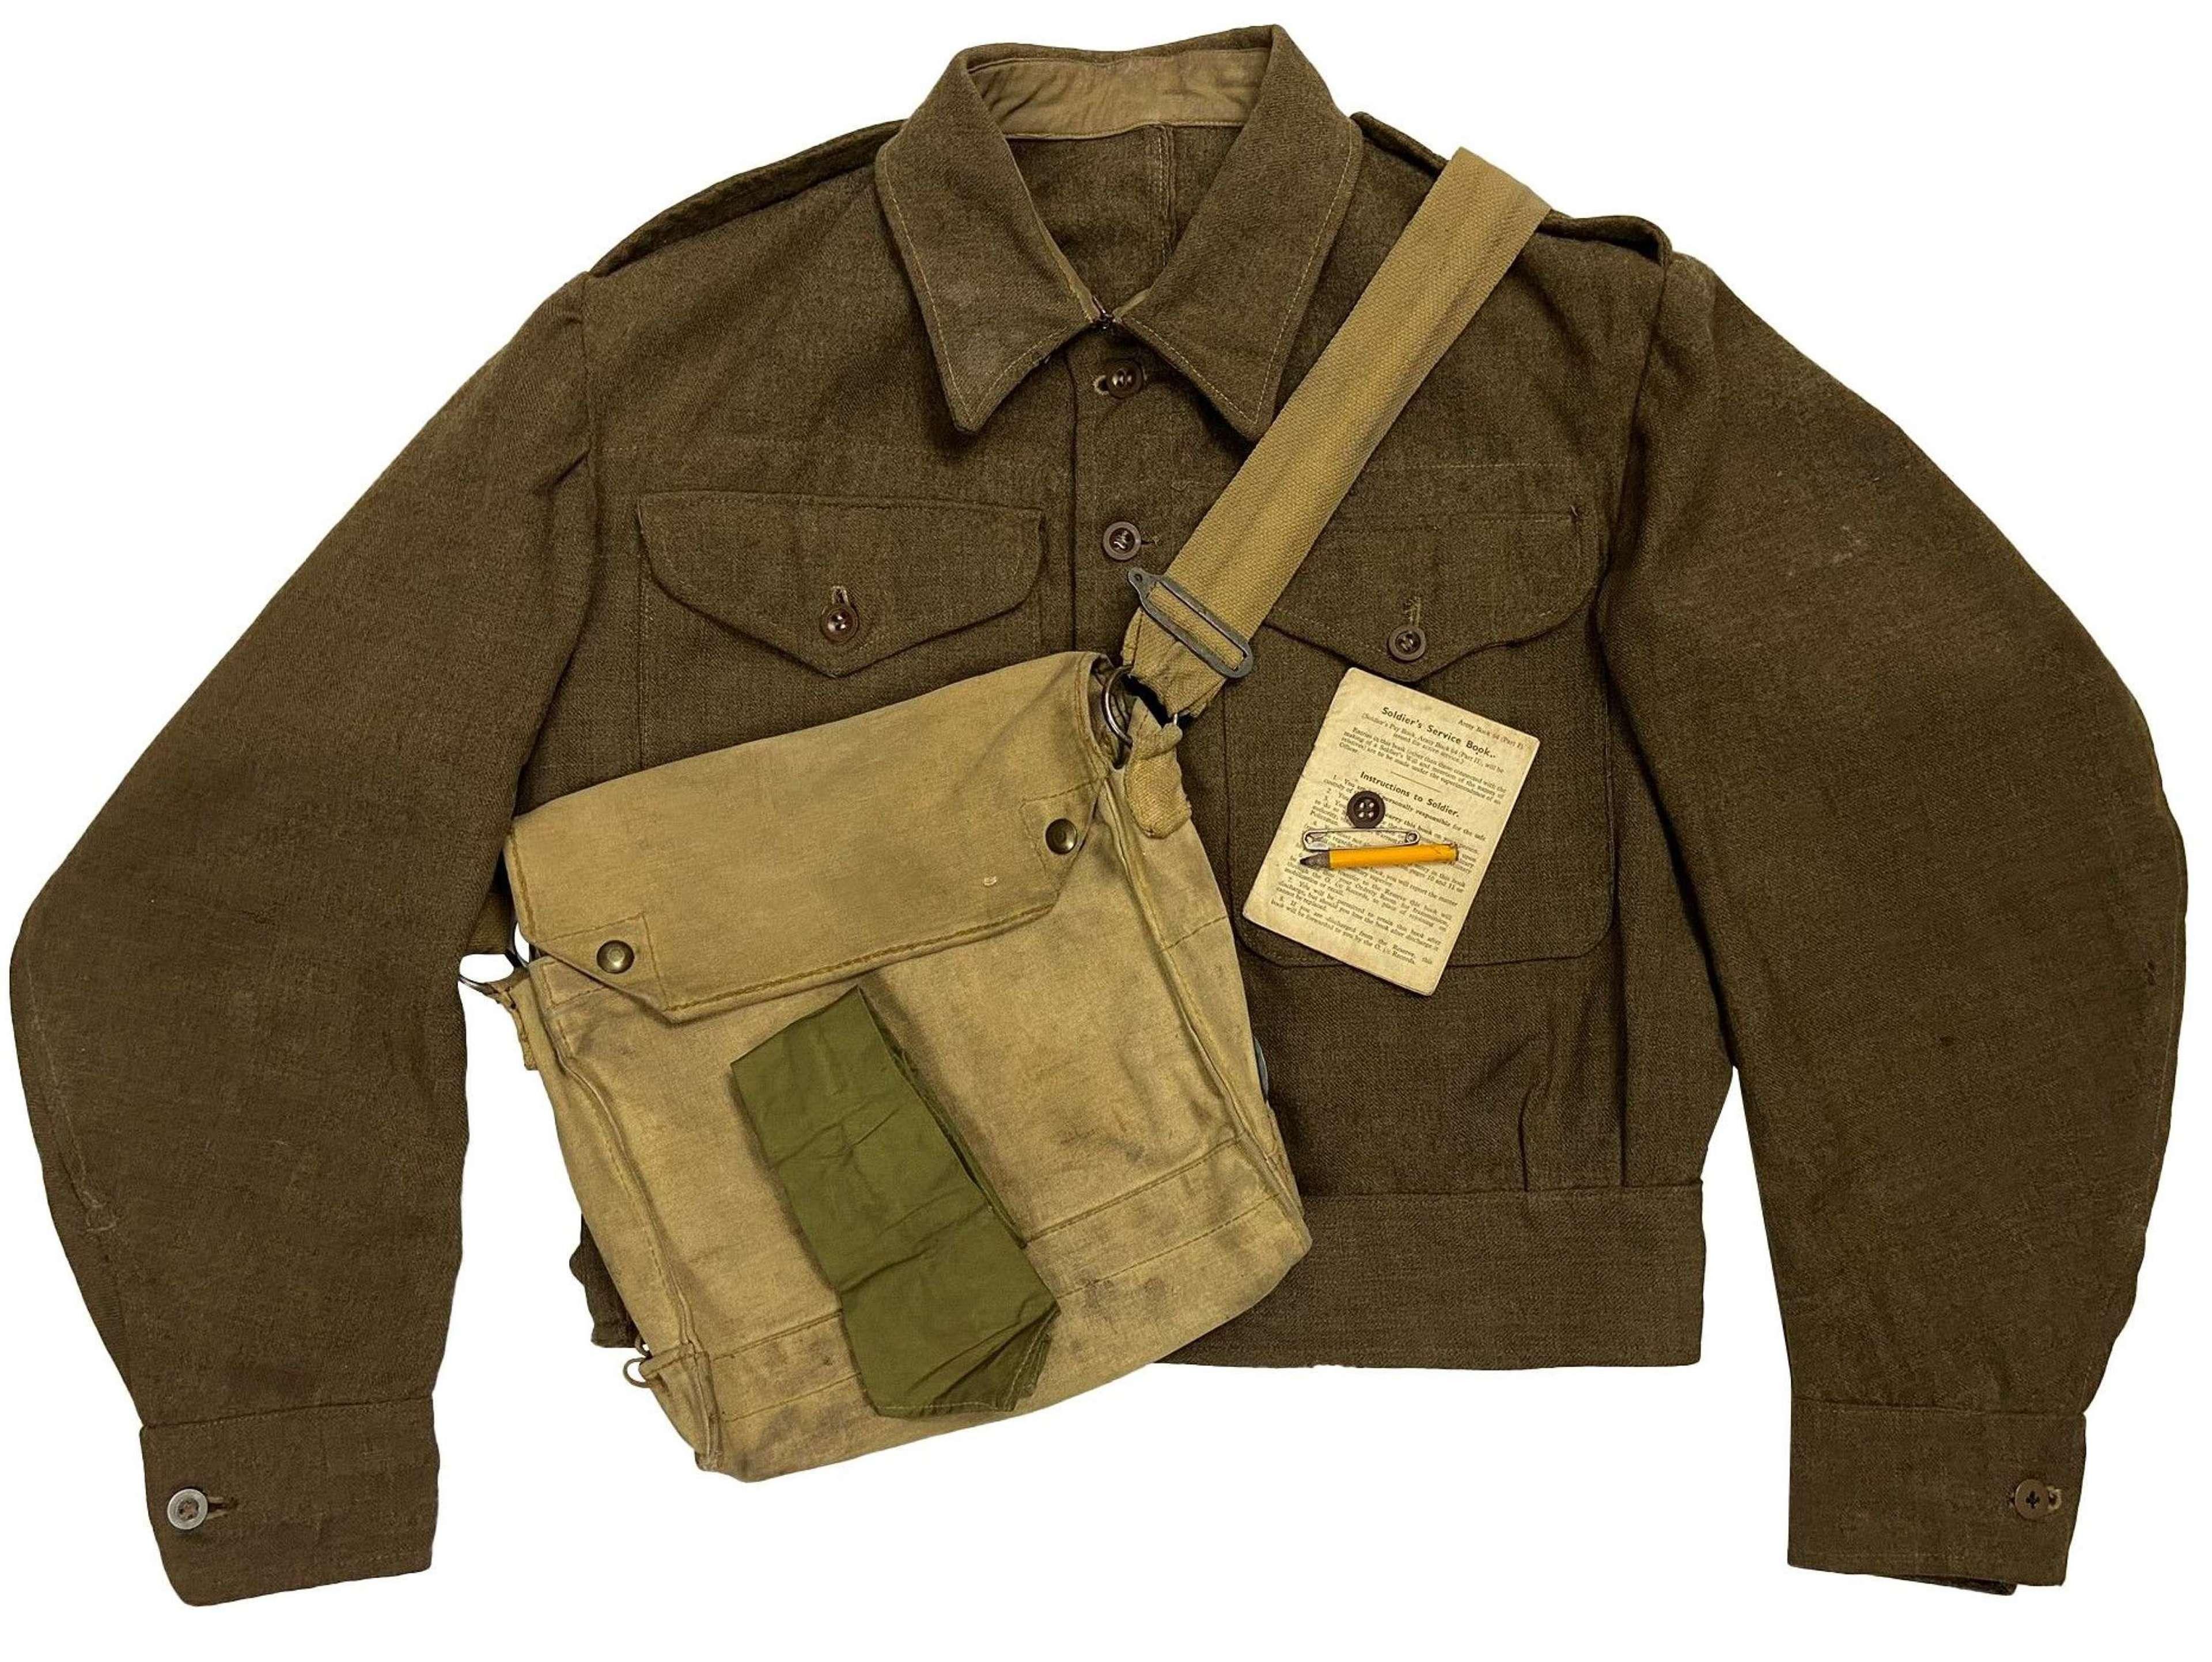 Original WW2 British Army RASC Battledress Uniform Grouping